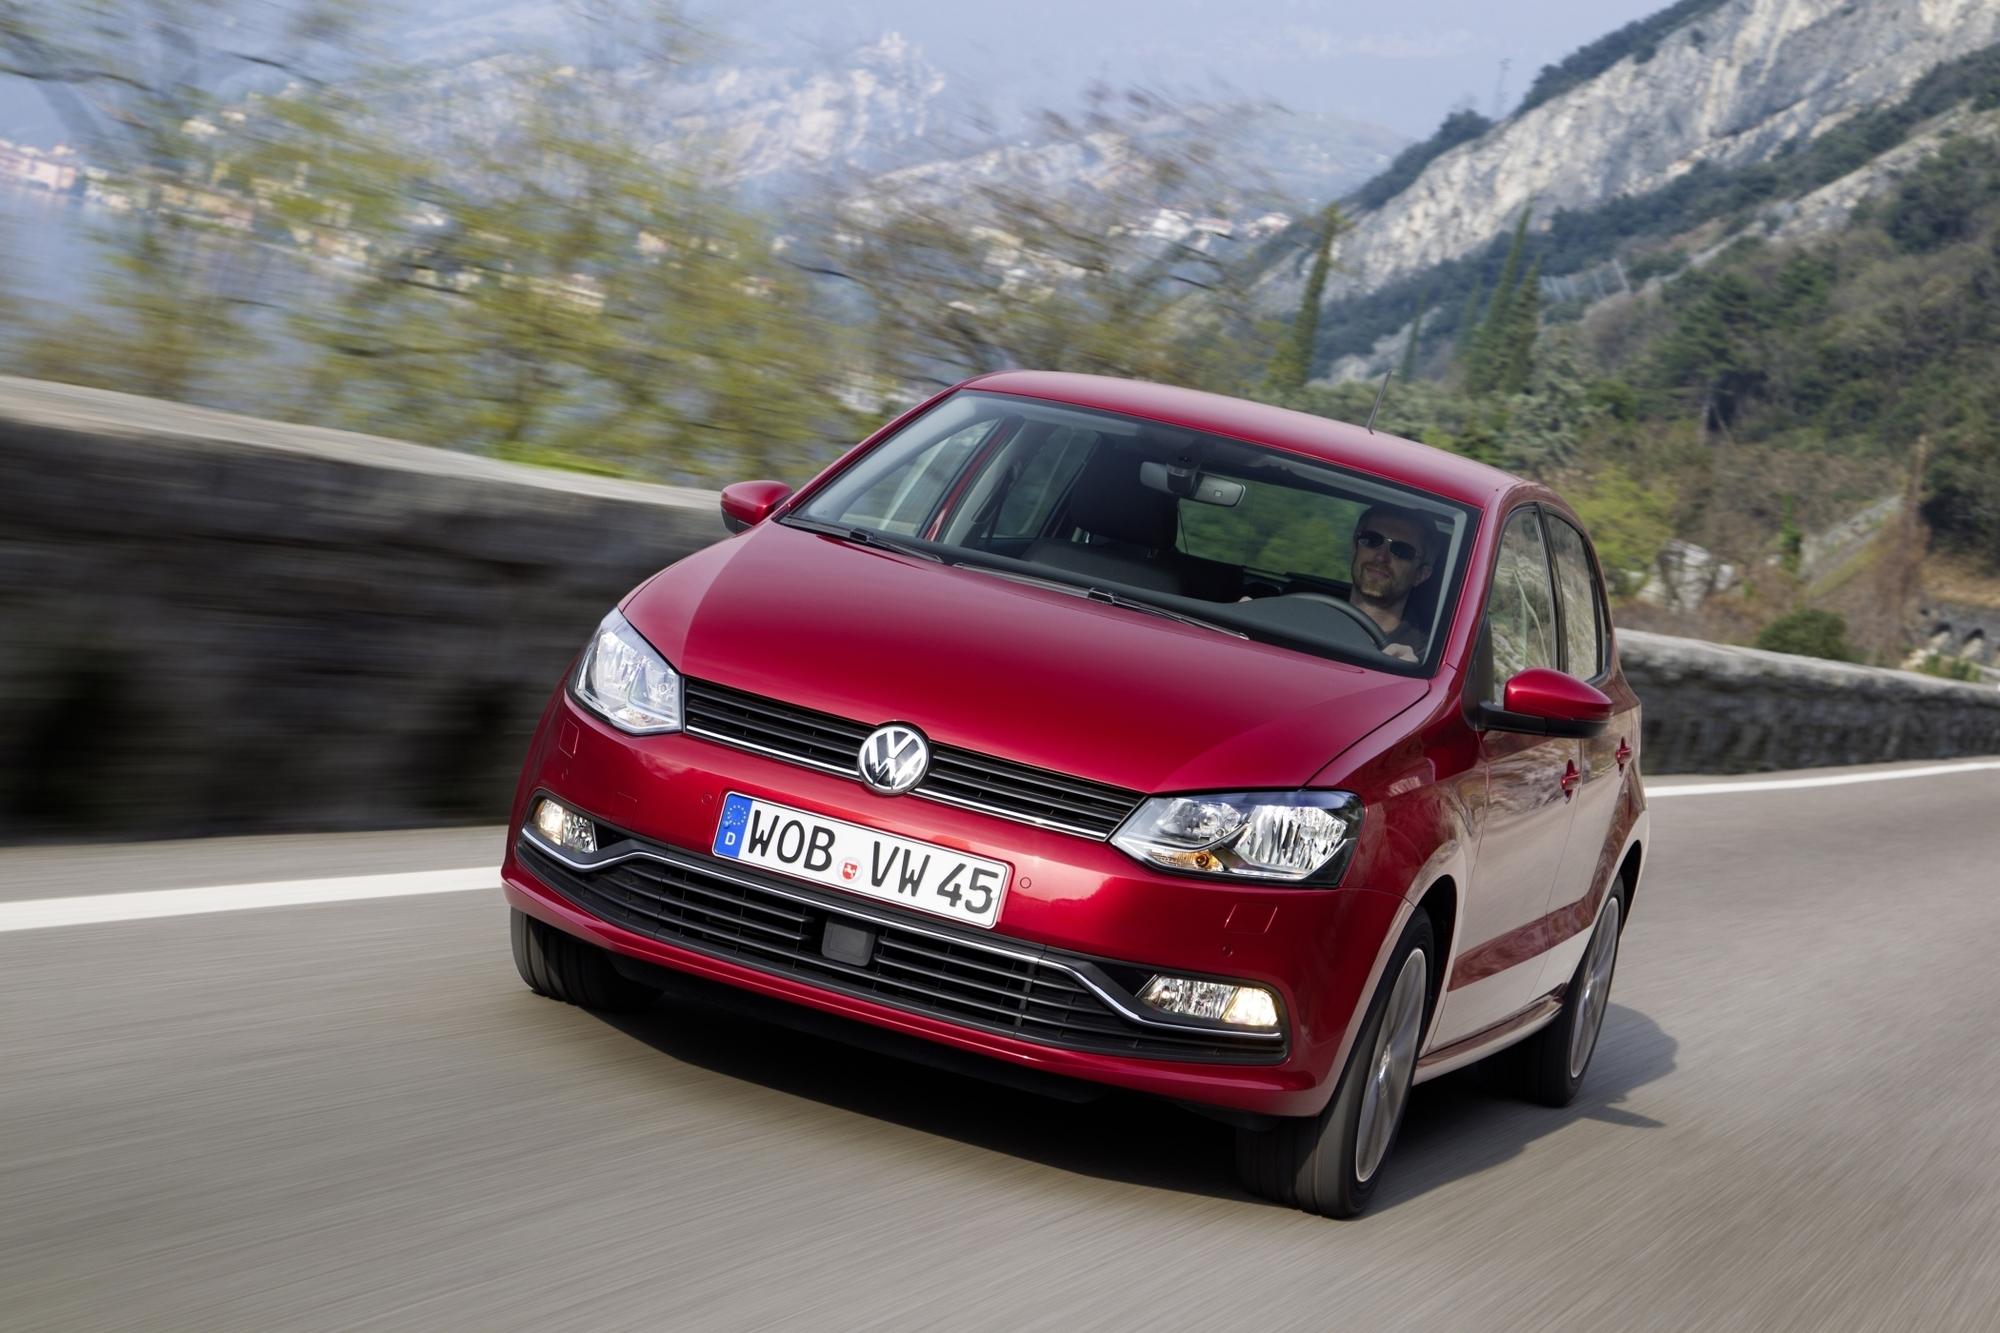 Test: VW Polo 1.2 TSI - Zum Golf geliftet